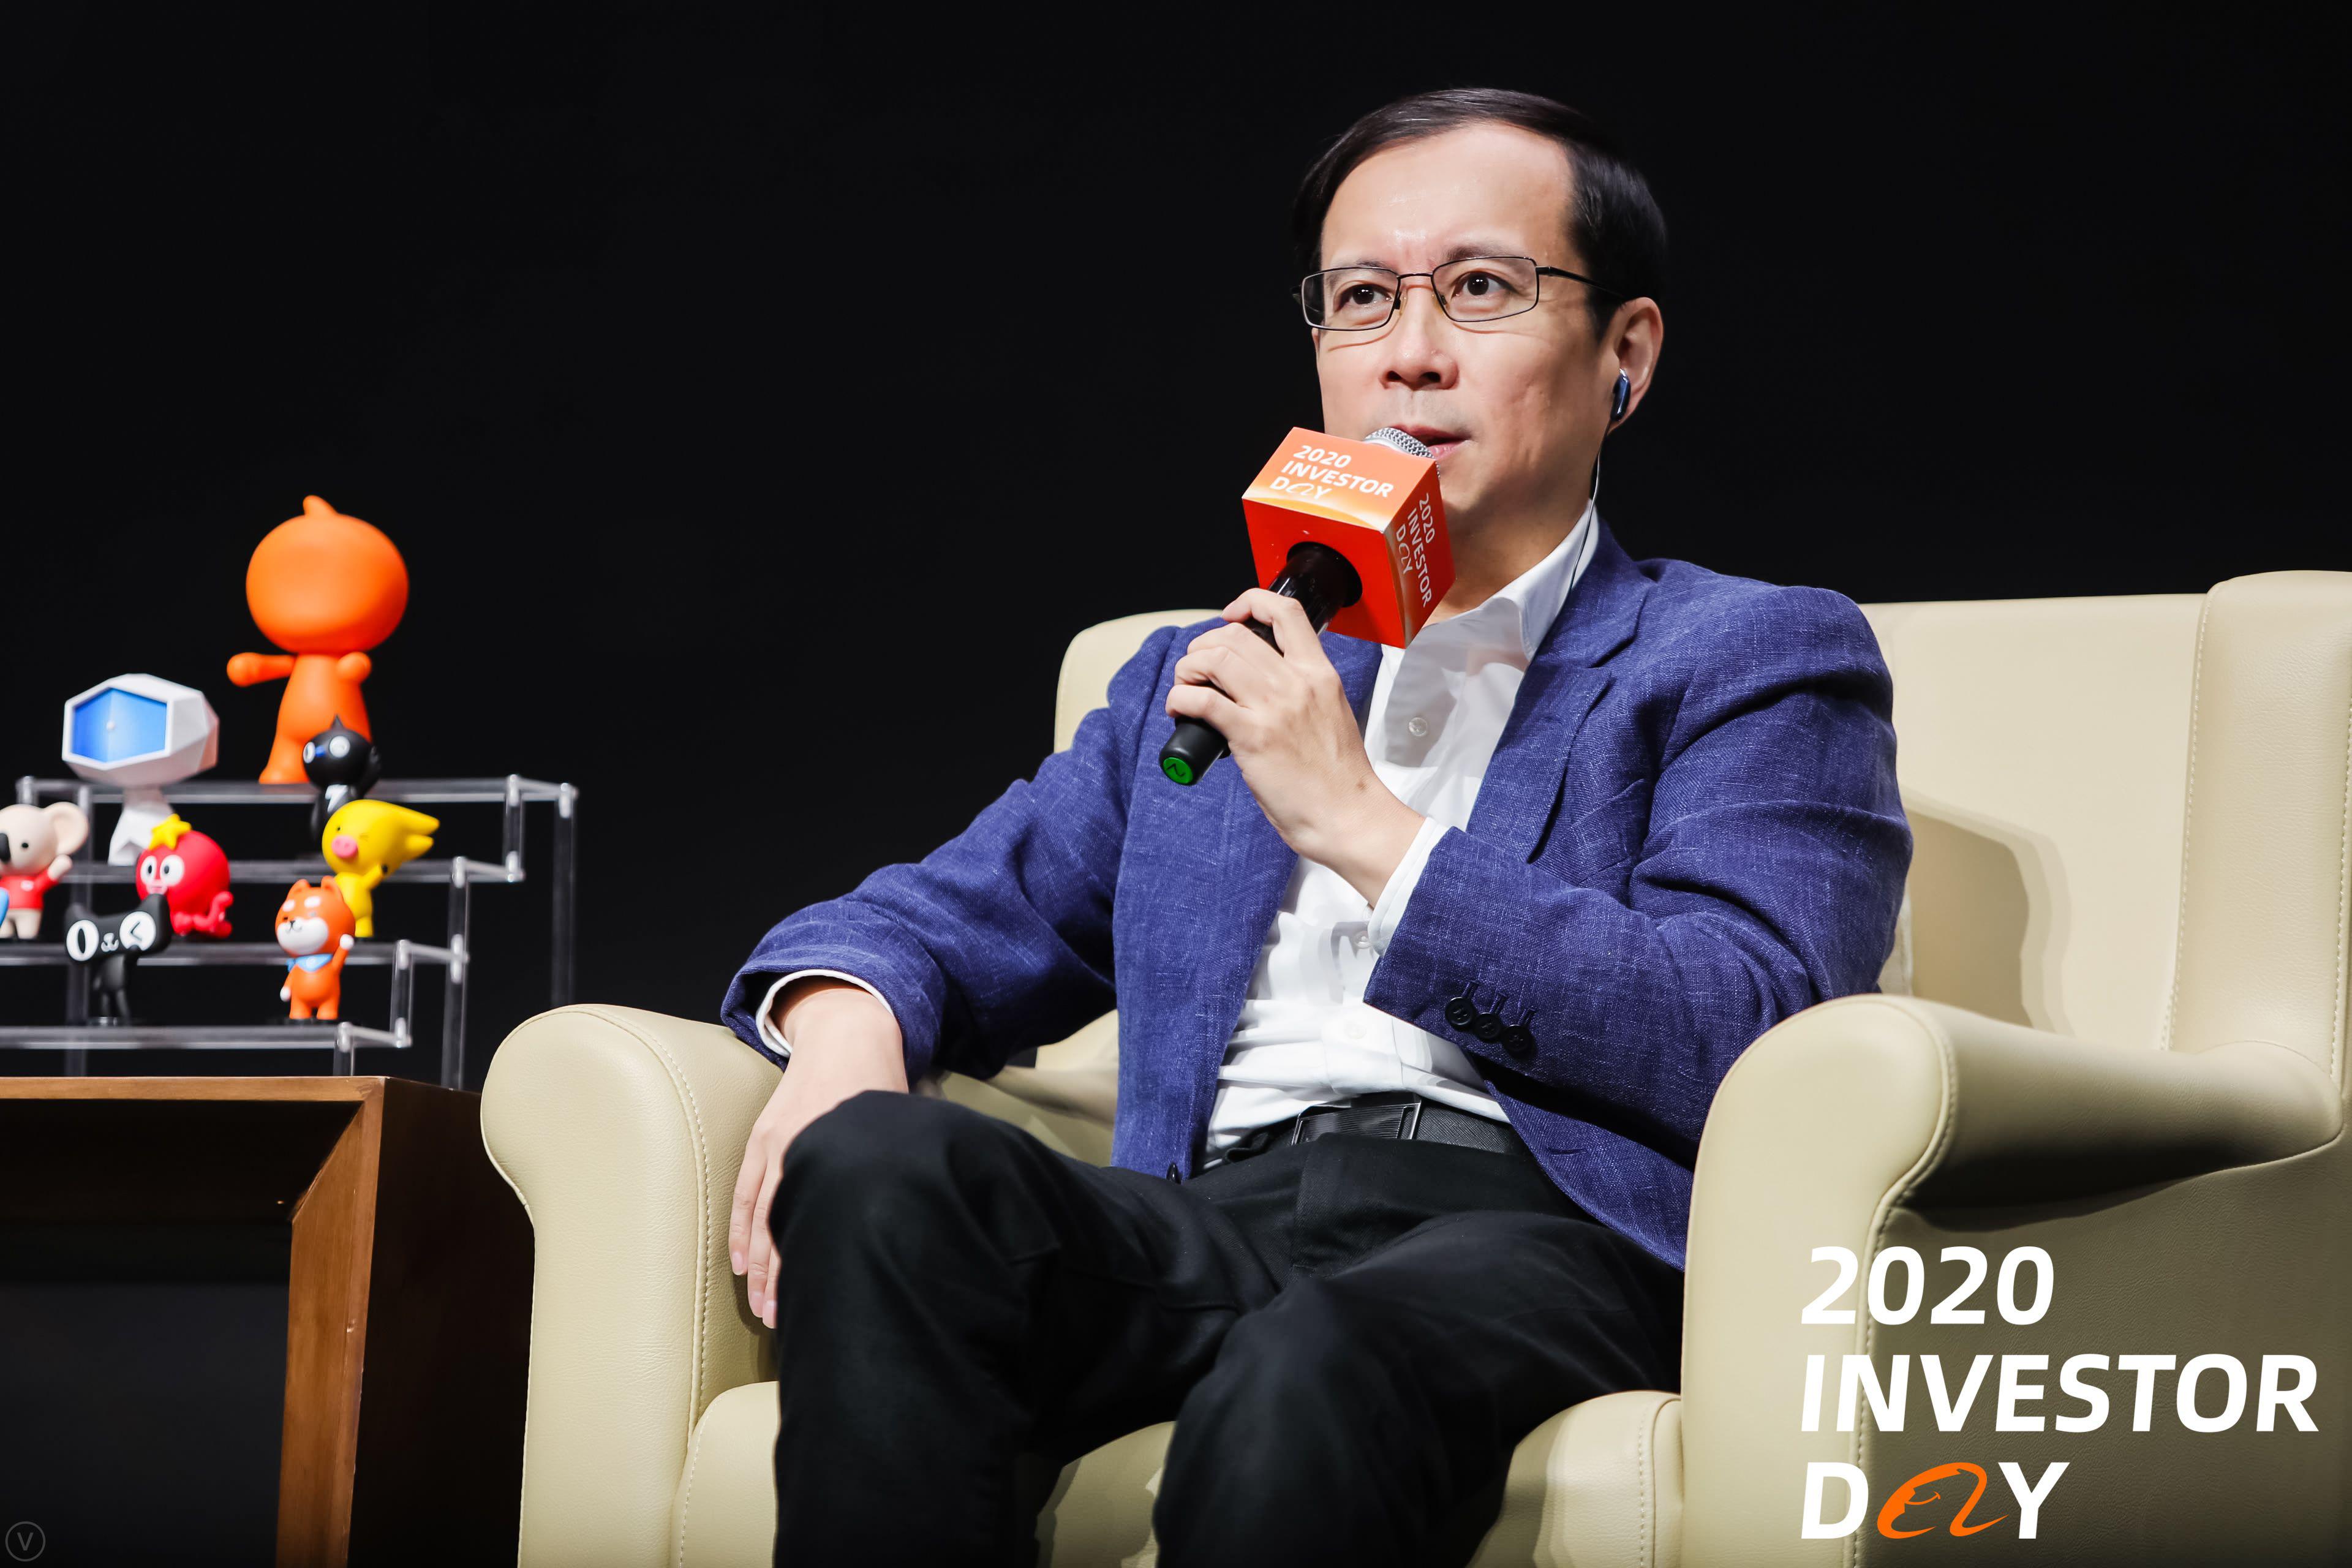 Sorotan Investor Day Alibaba Group 2020